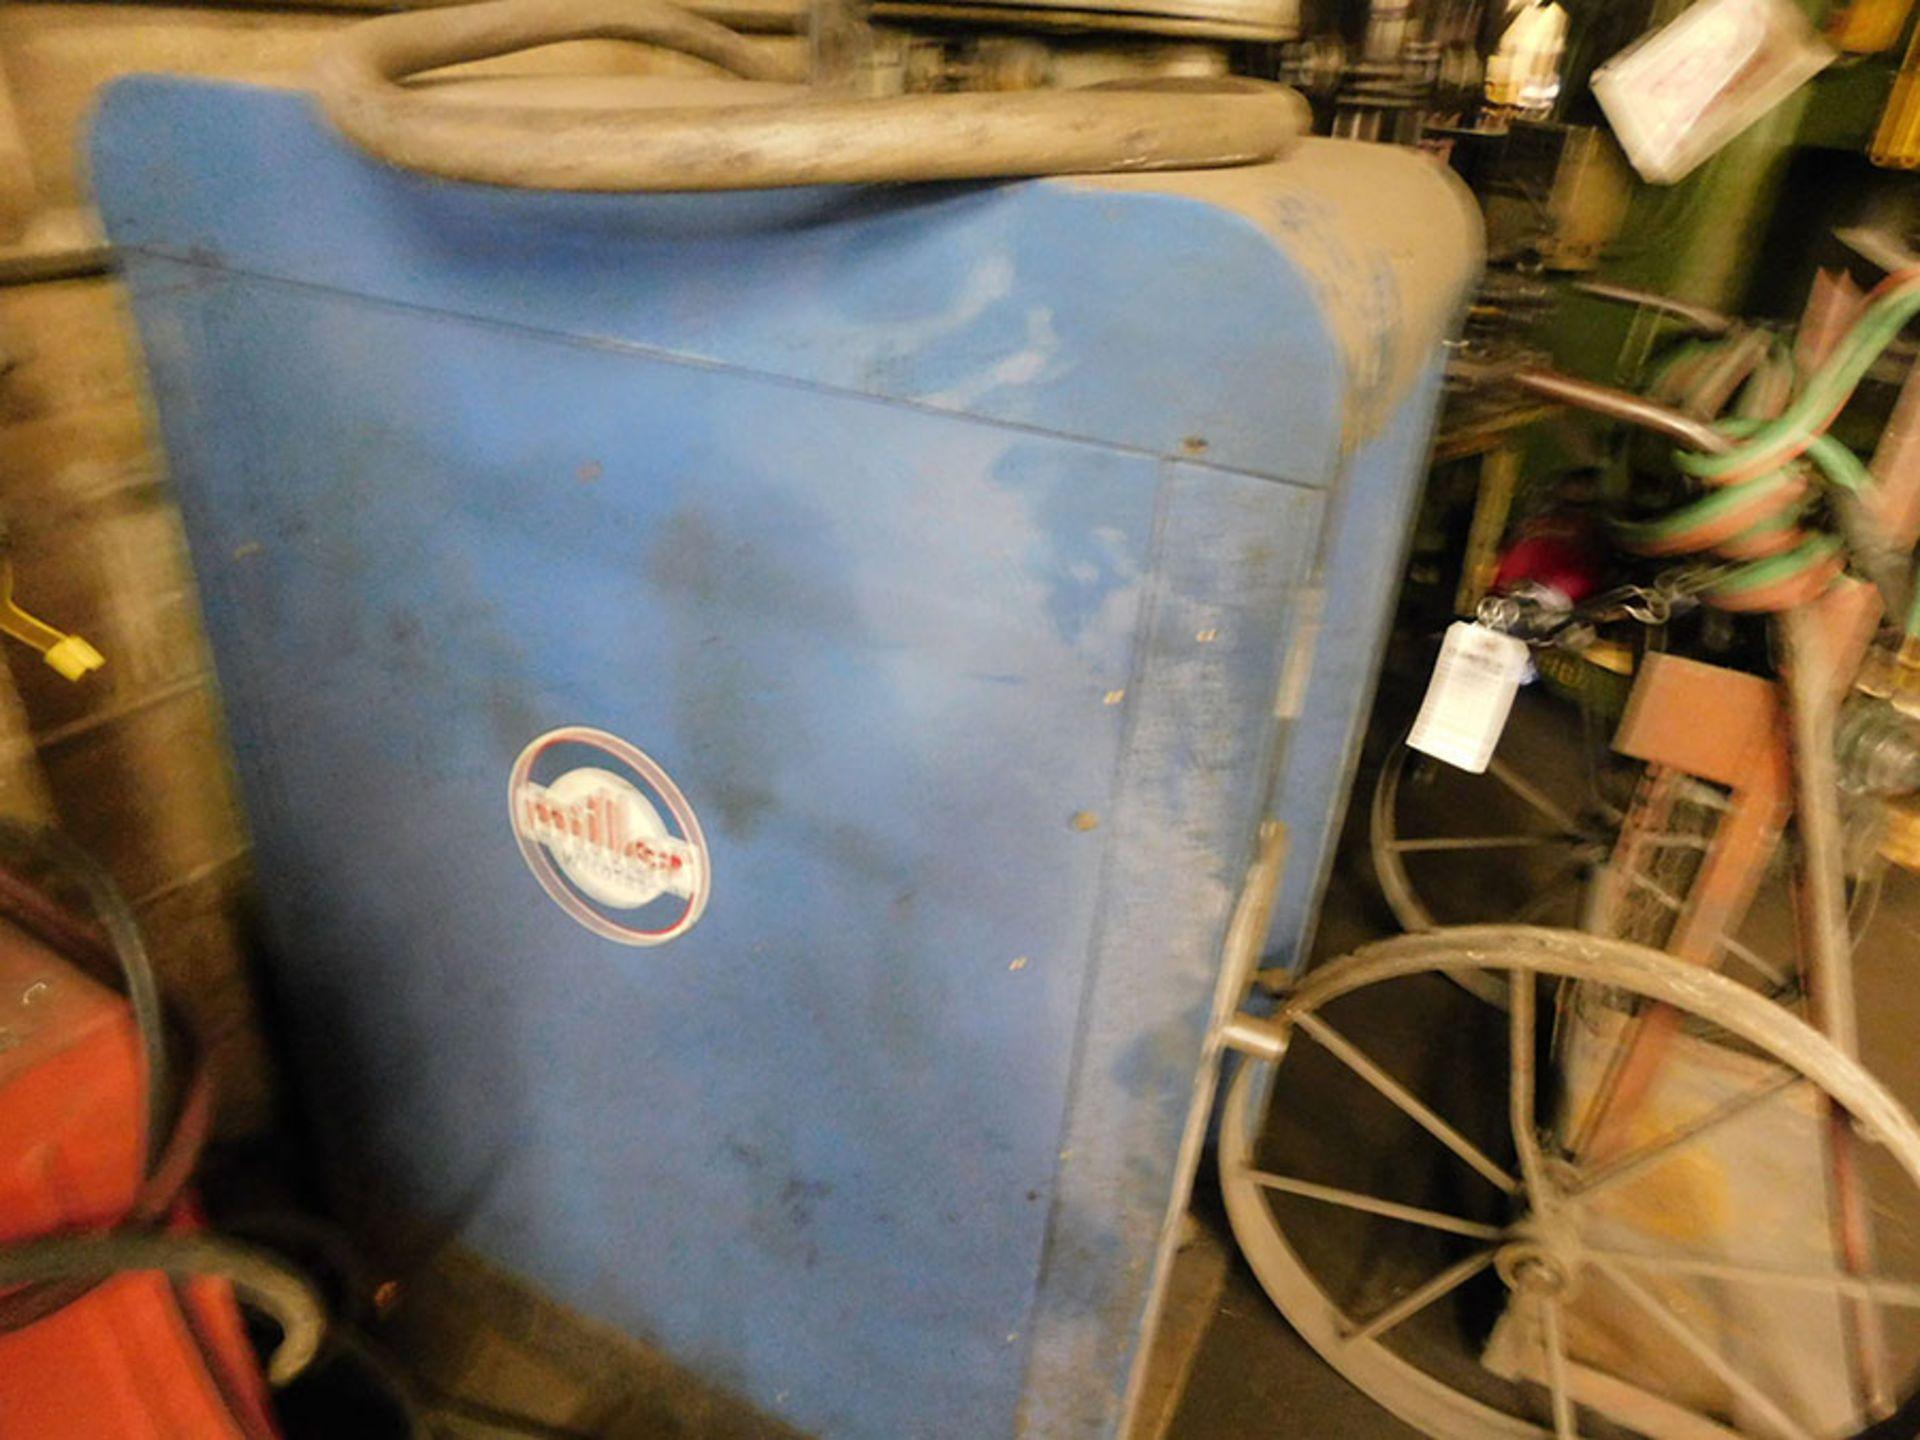 Lot 381 - MILLER AC/DC ARC WELDER; MODEL MD-330, S/N 70-551109, 230/460 VOLT, 60 CY FREQUENCY